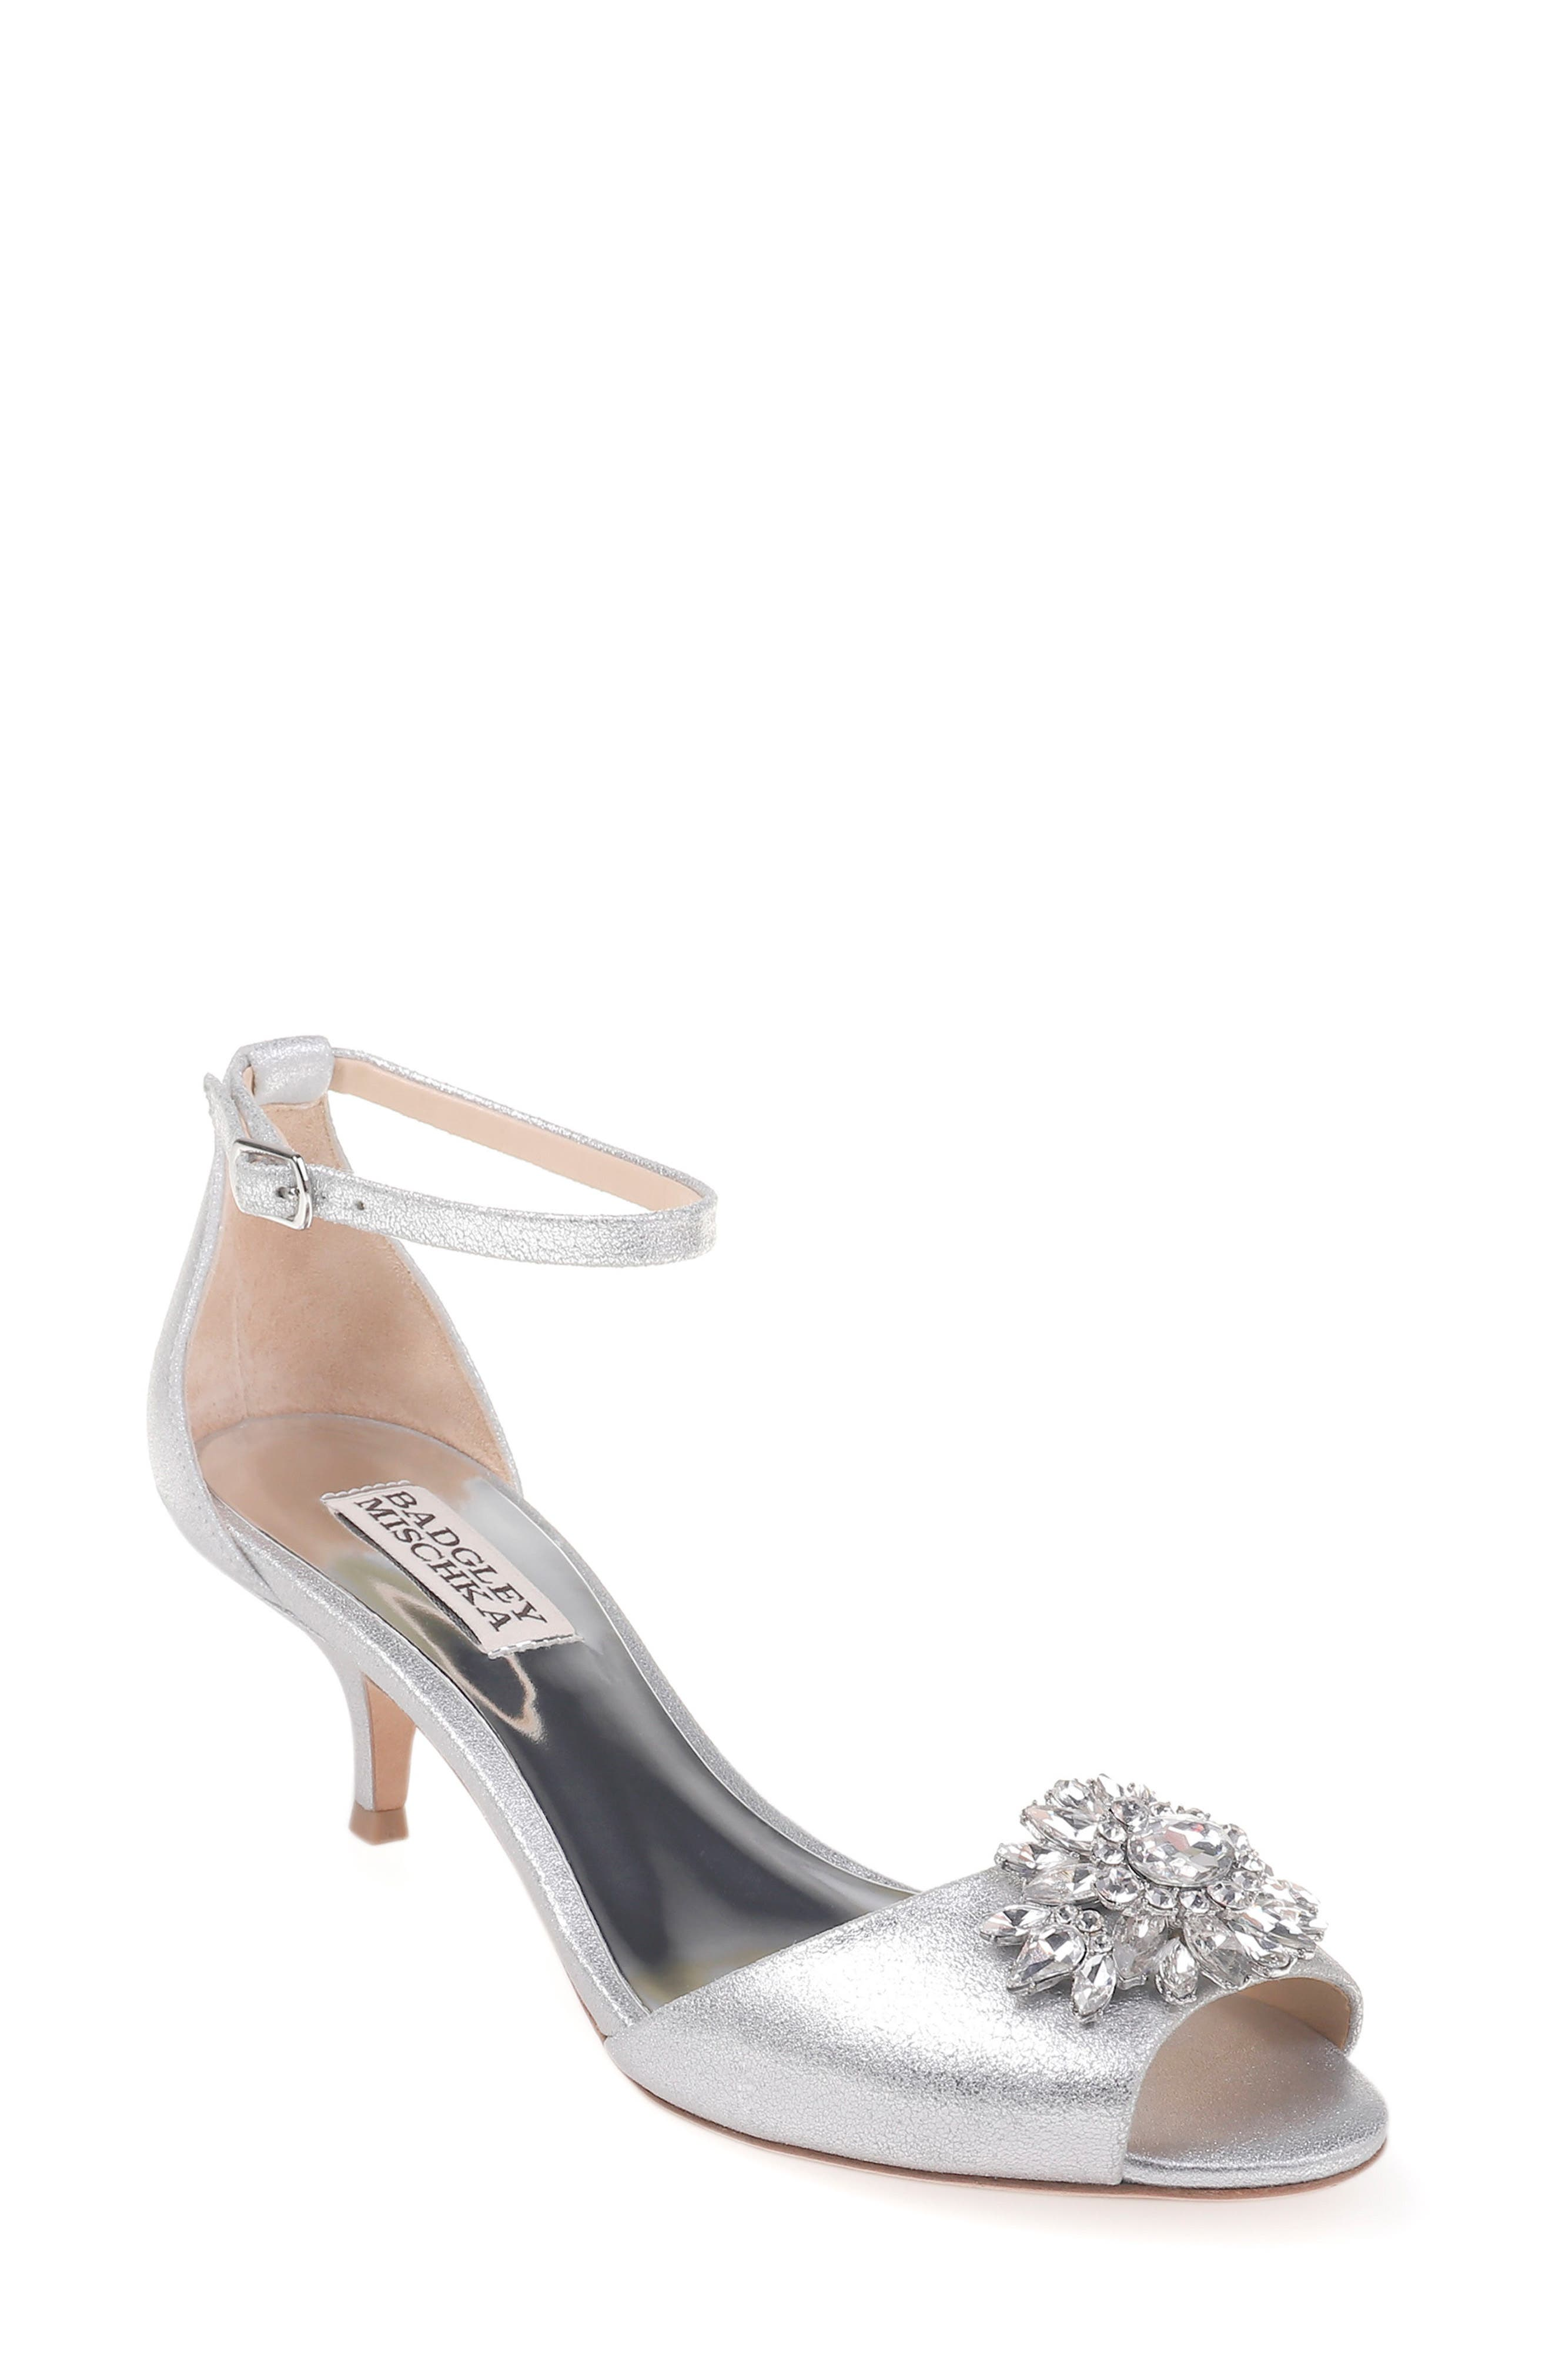 Sainte Crystal Embellished Sandal,                             Main thumbnail 1, color,